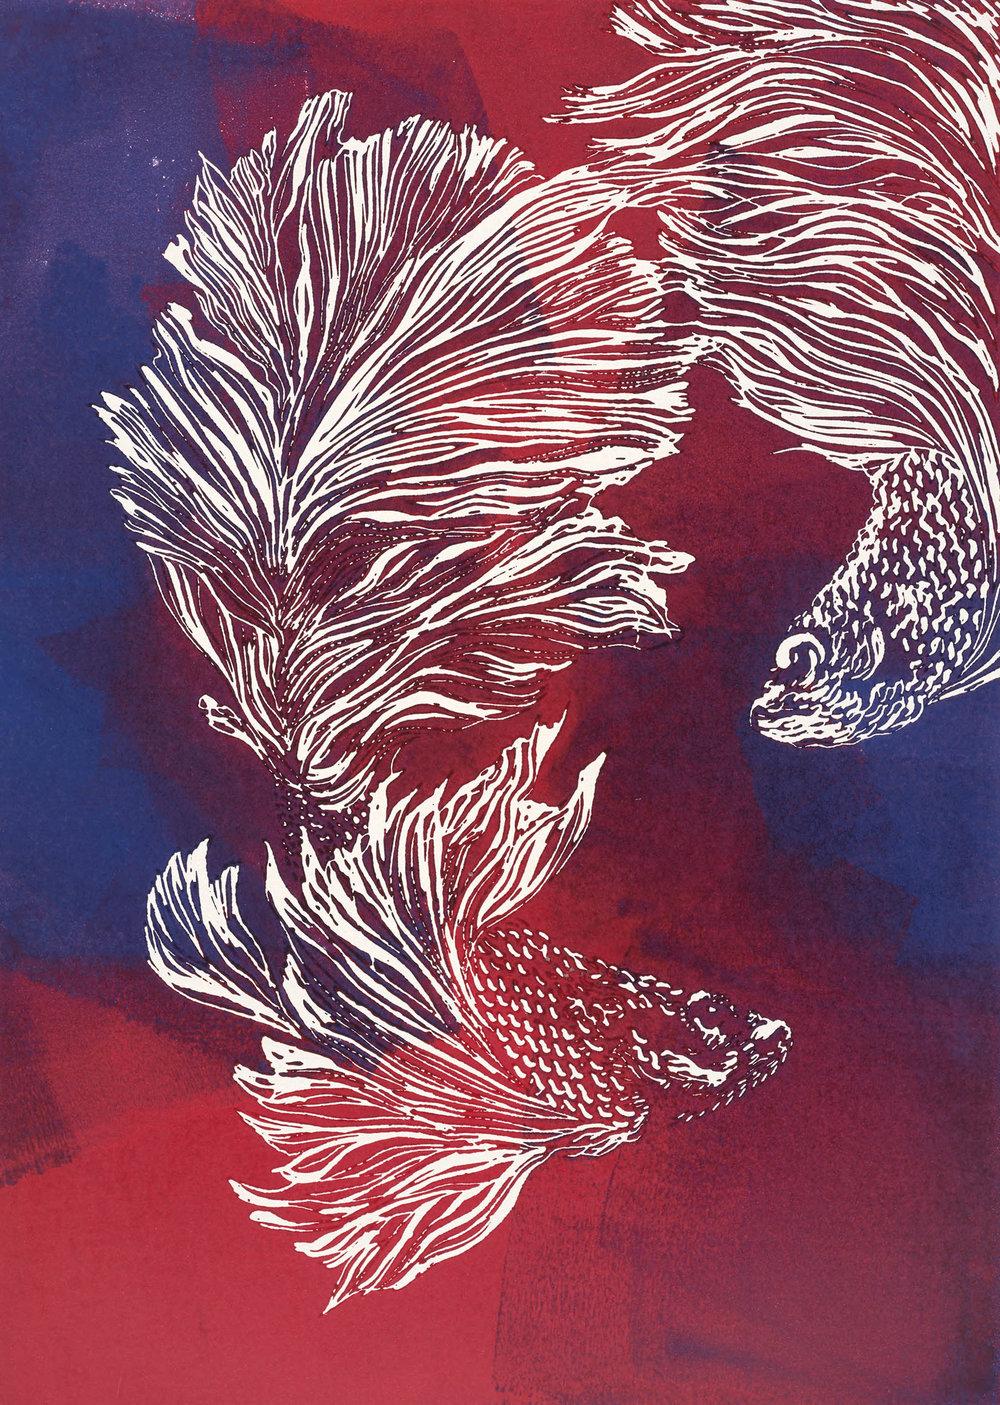 SiameseFightingFish,bl,r_12x16_2017.jpg